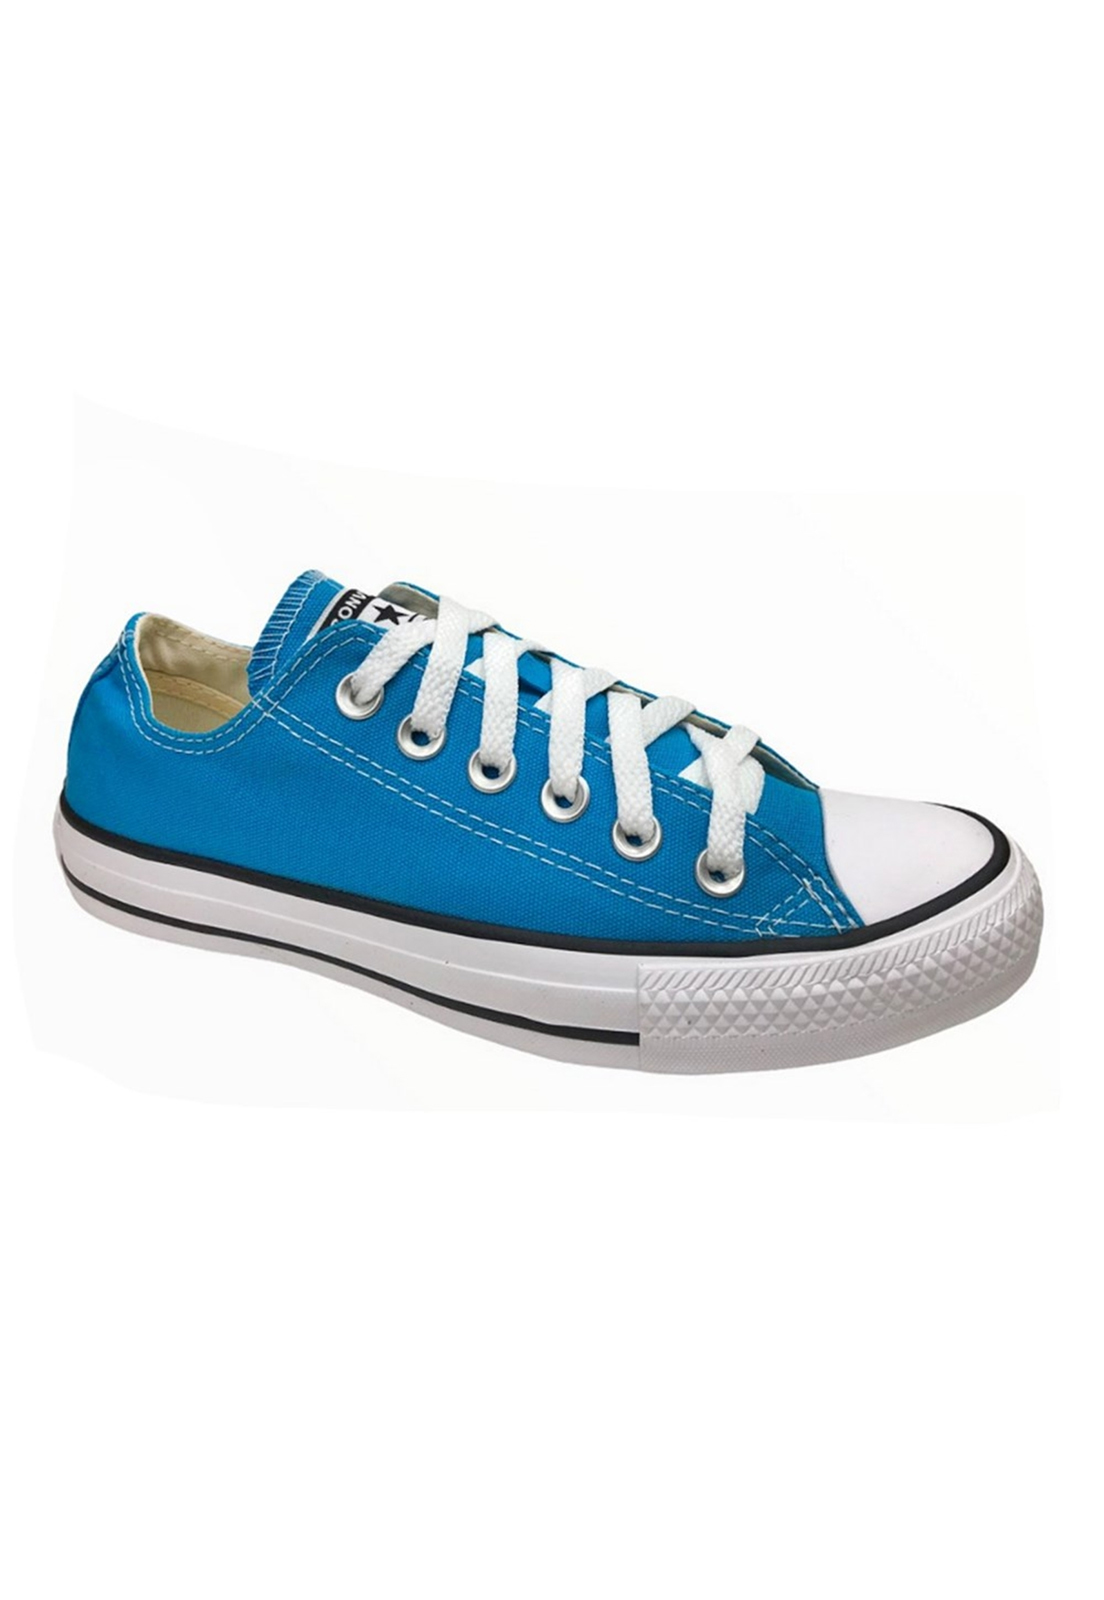 Tênis Converse All Star Chuck Taylor azul